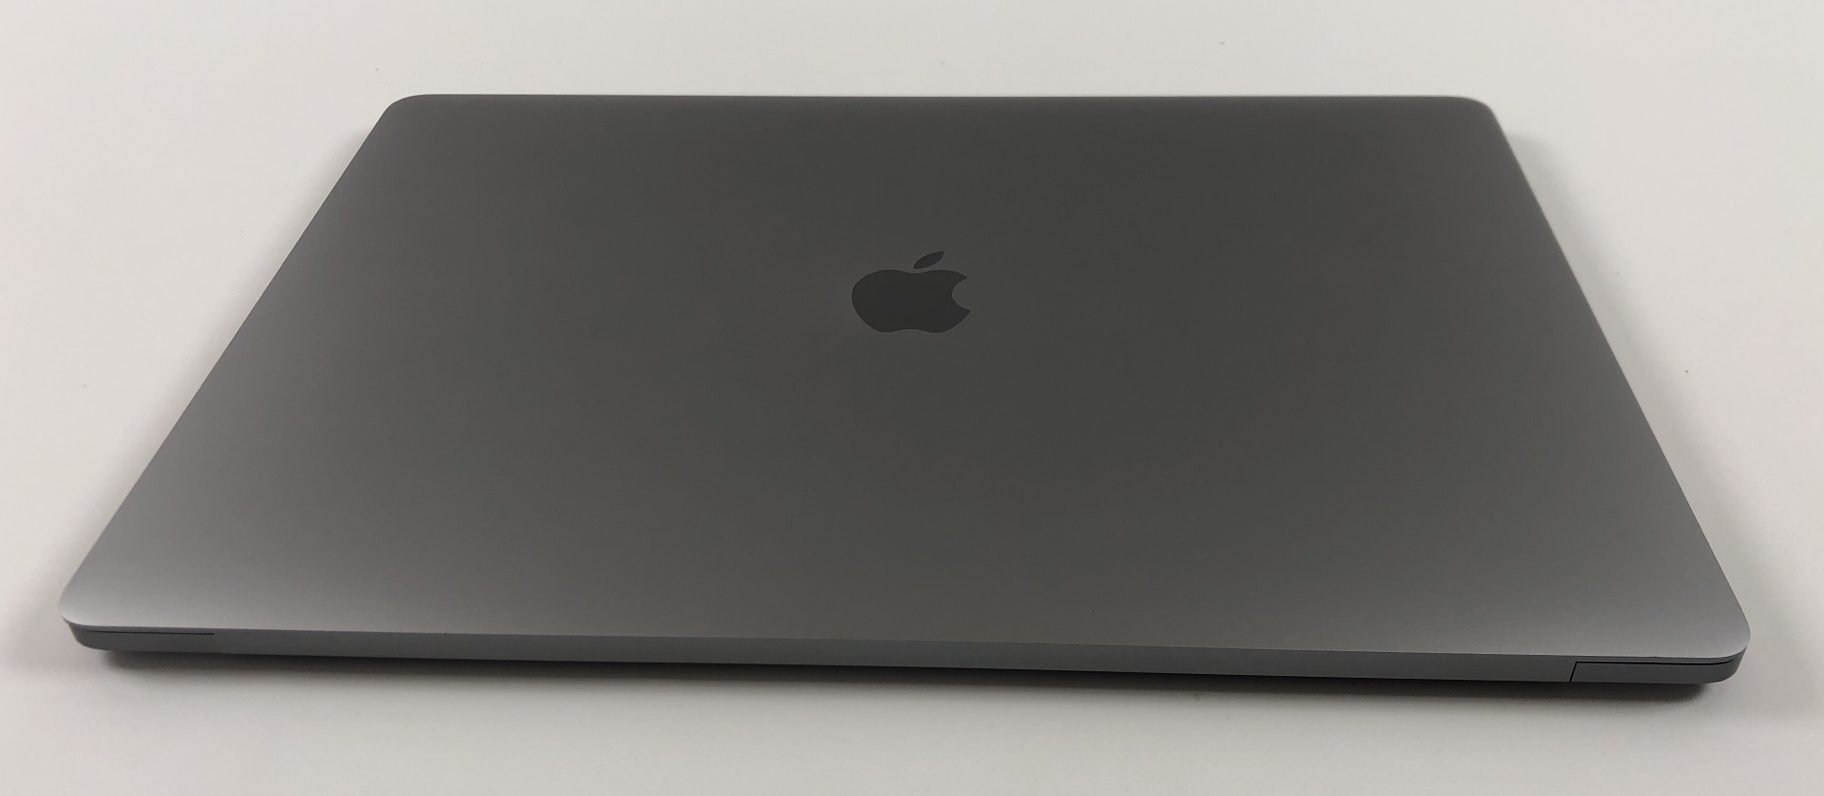 "MacBook Pro 15"" Touch Bar Mid 2017 (Intel Quad-Core i7 2.9 GHz 16 GB RAM 512 GB SSD), Space Gray, Intel Quad-Core i7 2.9 GHz, 16 GB RAM, 512 GB SSD, imagen 2"